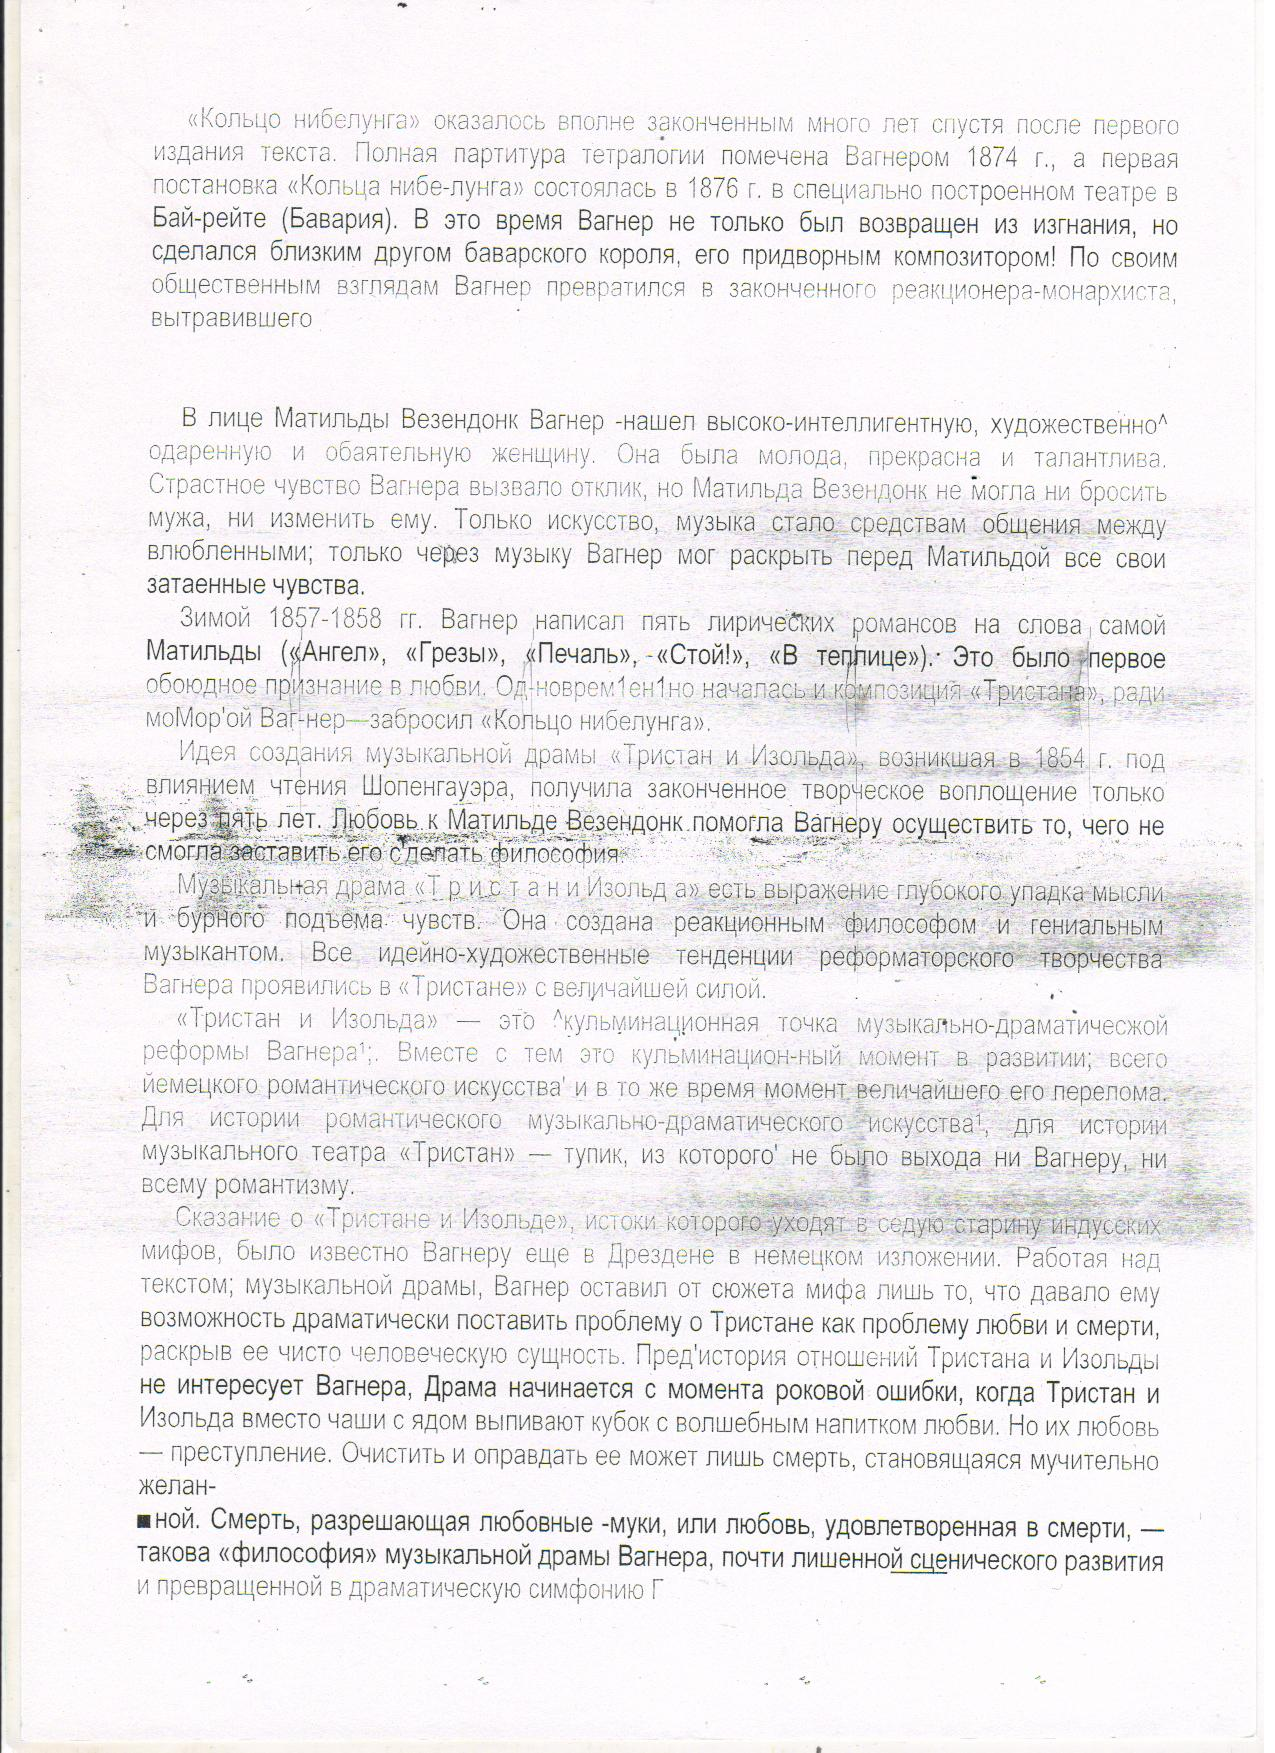 C:\Documents and Settings\Учитель\Рабочий стол\8.jpg